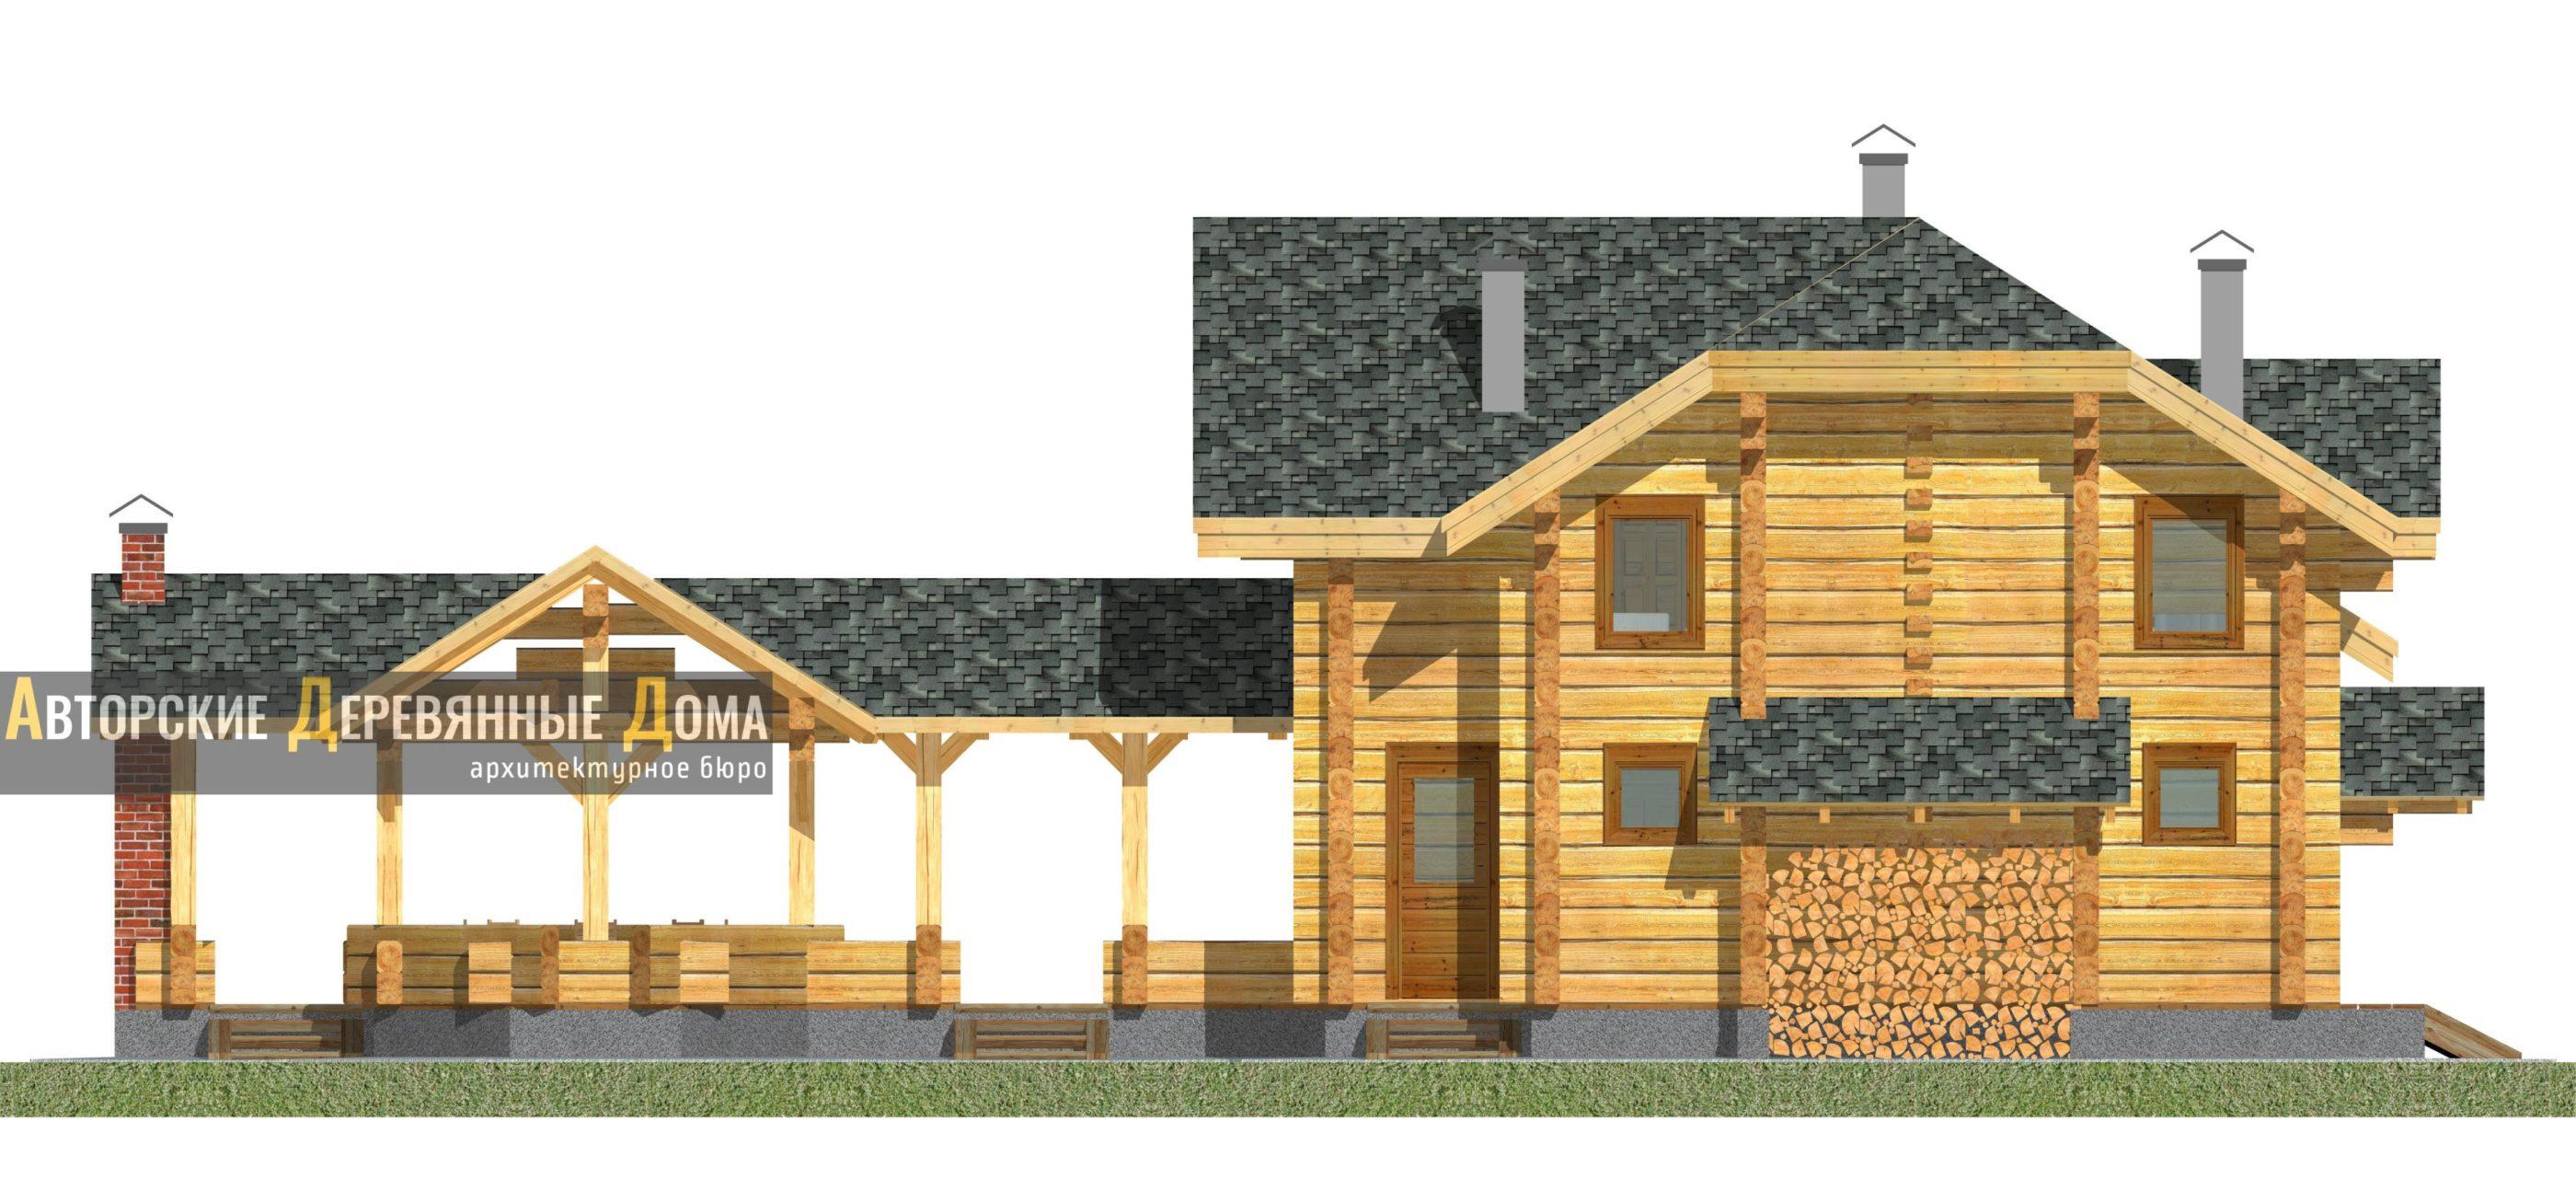 Дом-баня-беседка – фасад 2